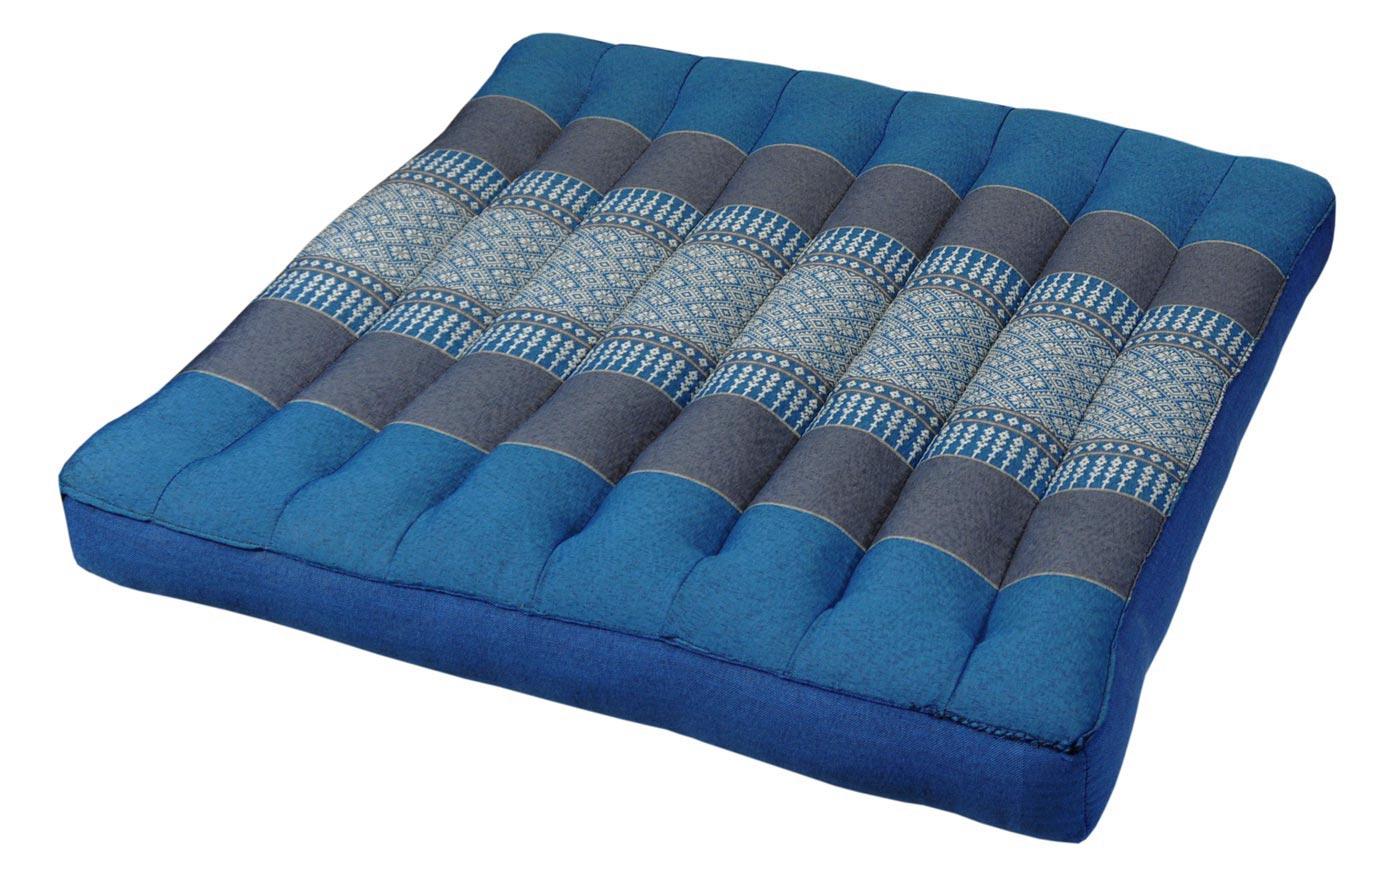 Coussins tha landais matelas tapis canap m ditation traversin 826 - Matelas futon canape ...